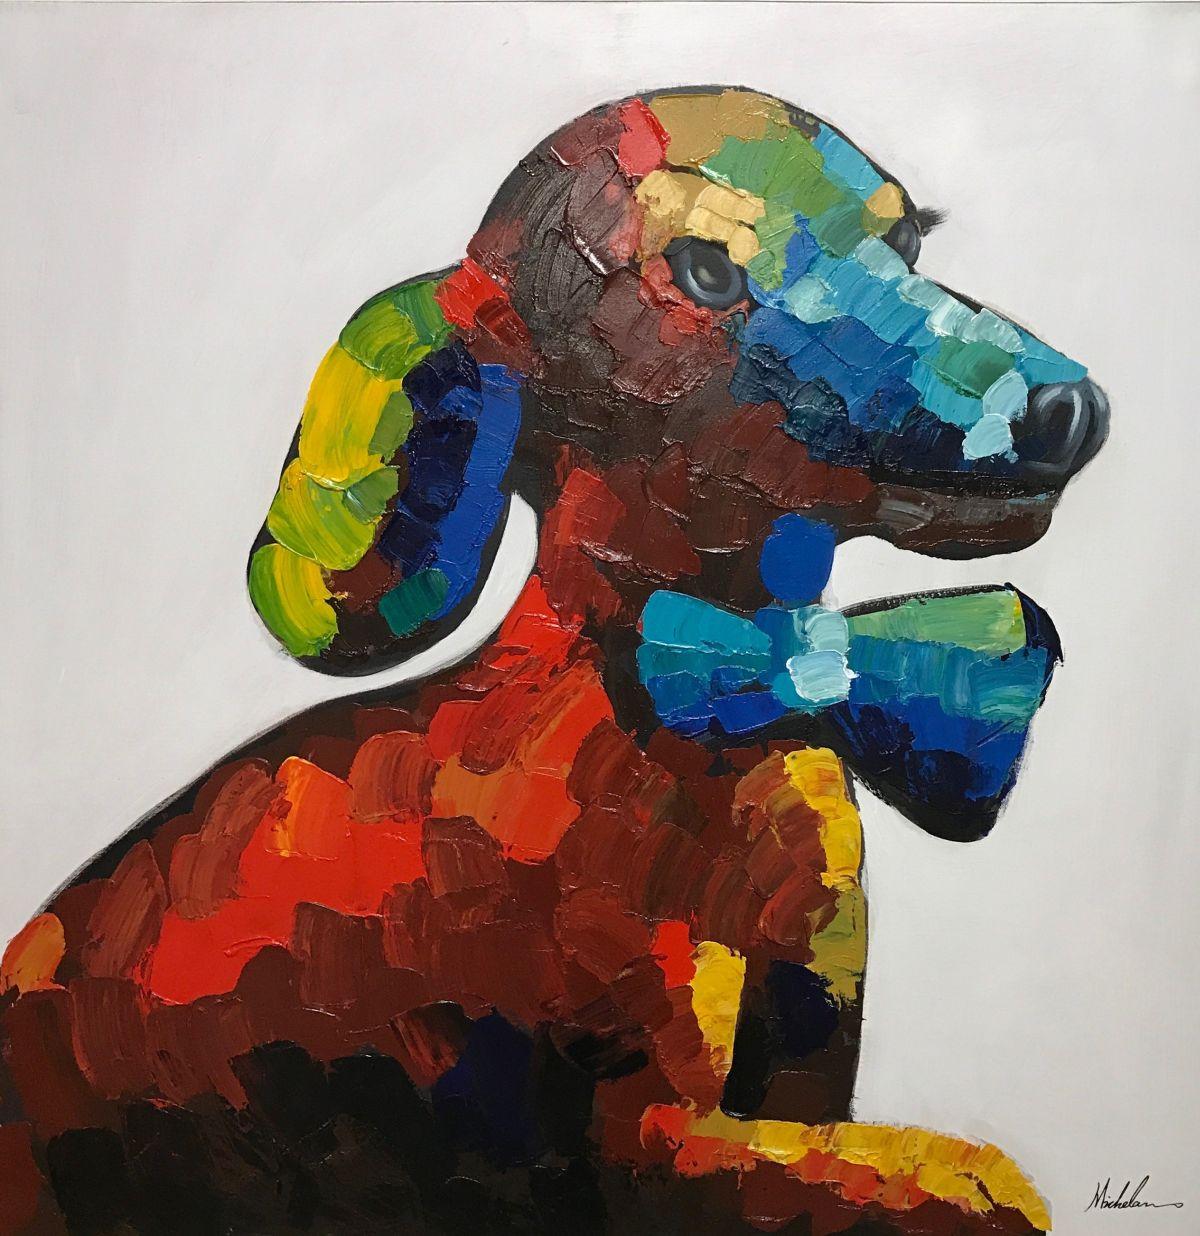 MaxTheTax - Konstlagret - Tavlor   Oljemålningar 3551a1da8dc1f